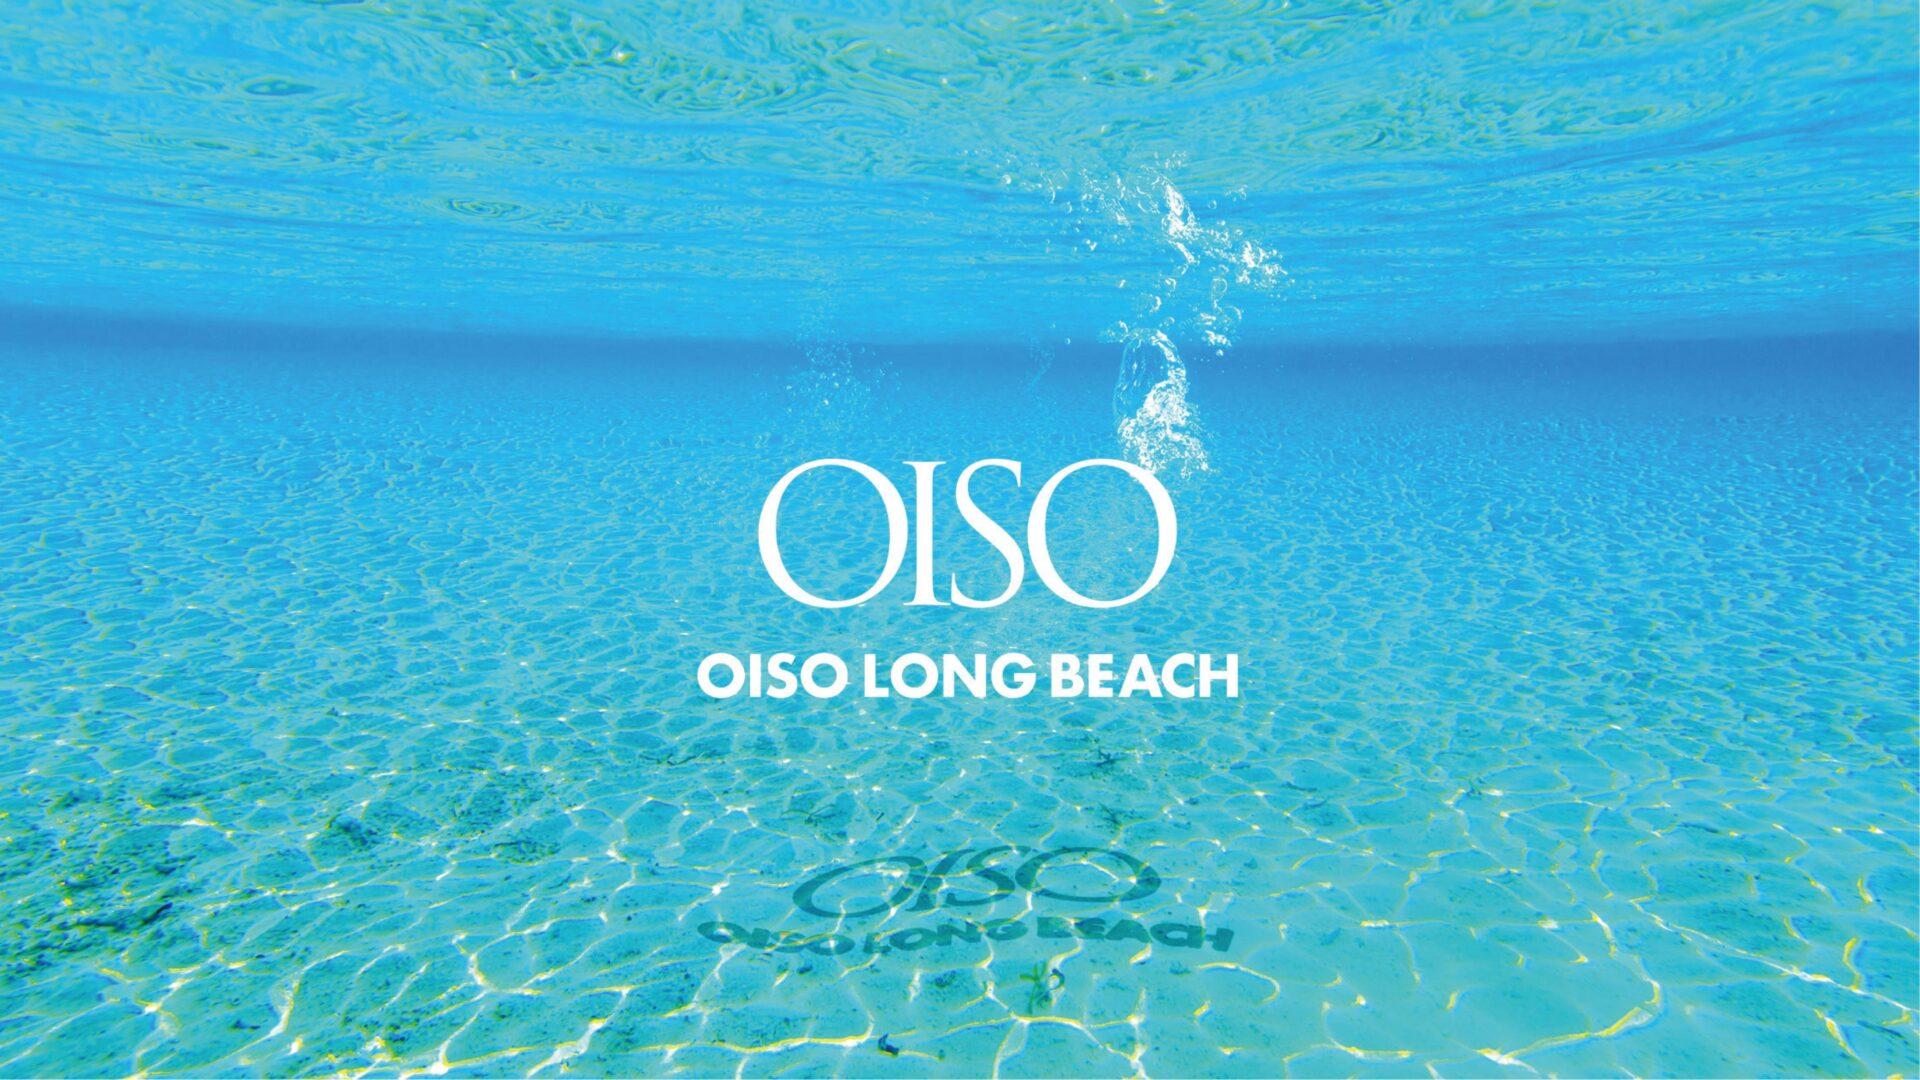 「PRINCE HOTEL OISO LONG BEACH」のサムネイル画像